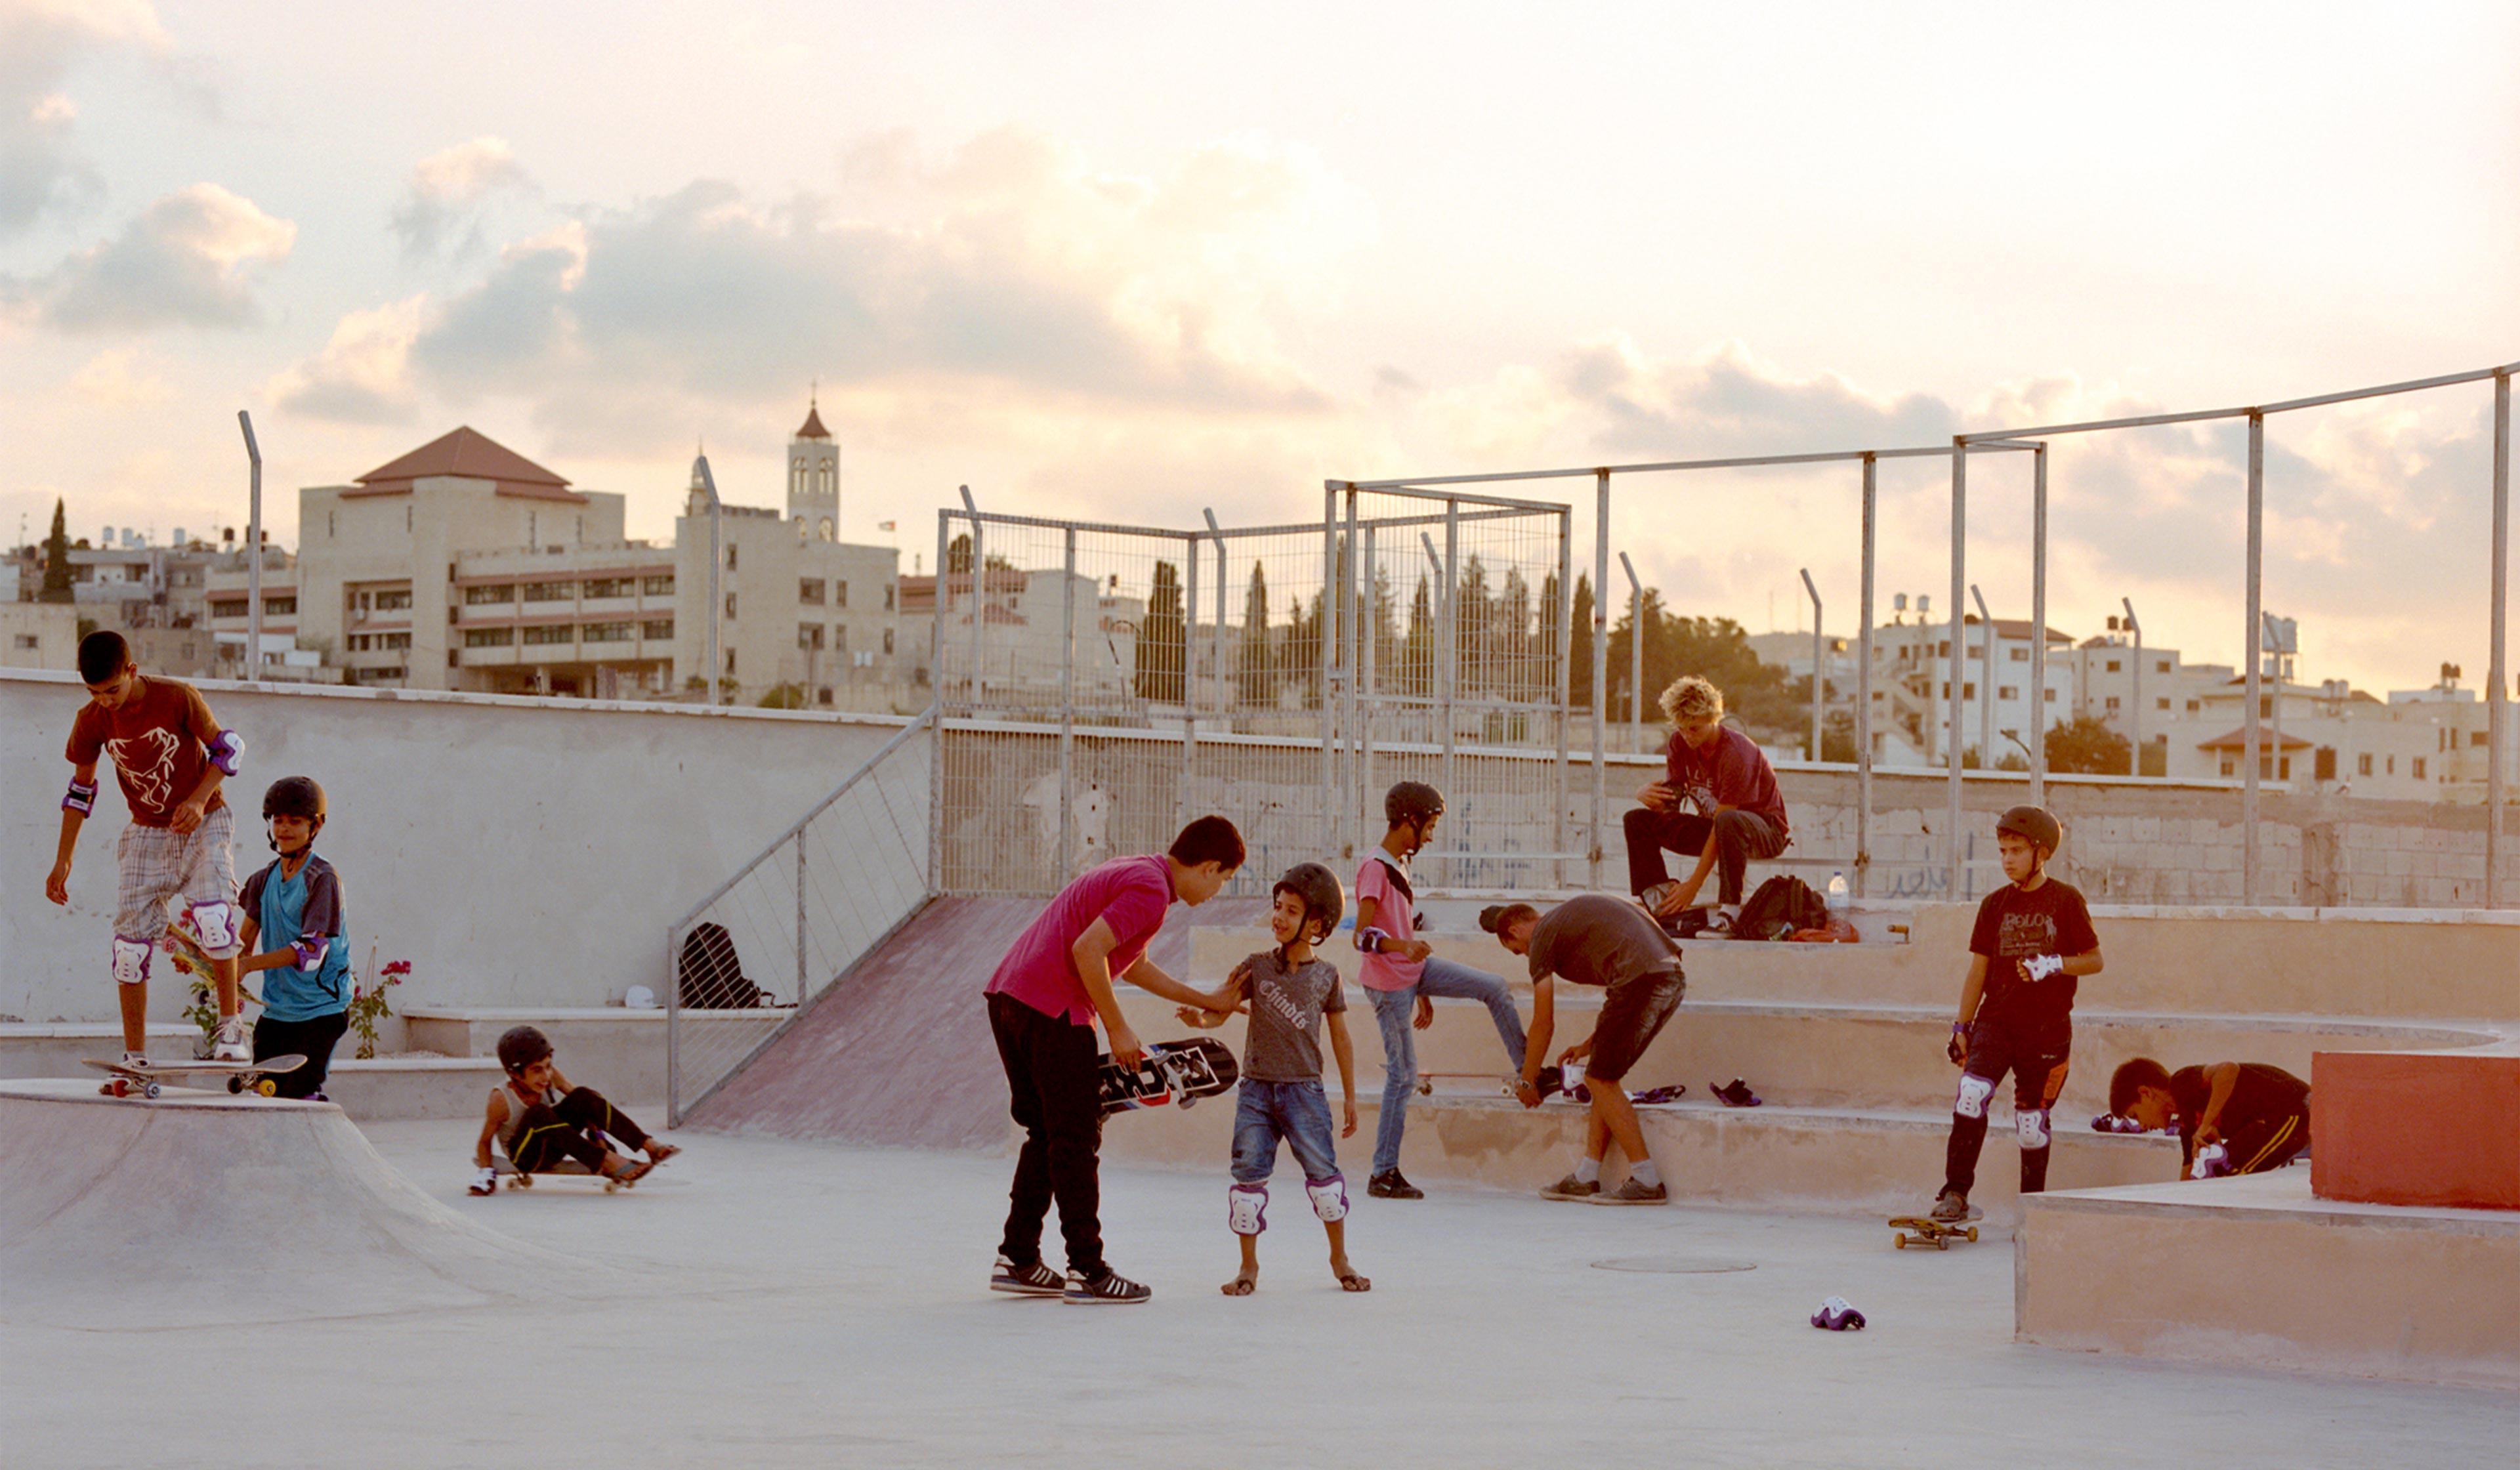 Skate-Palestine-Sam-Dearden-Huck-C